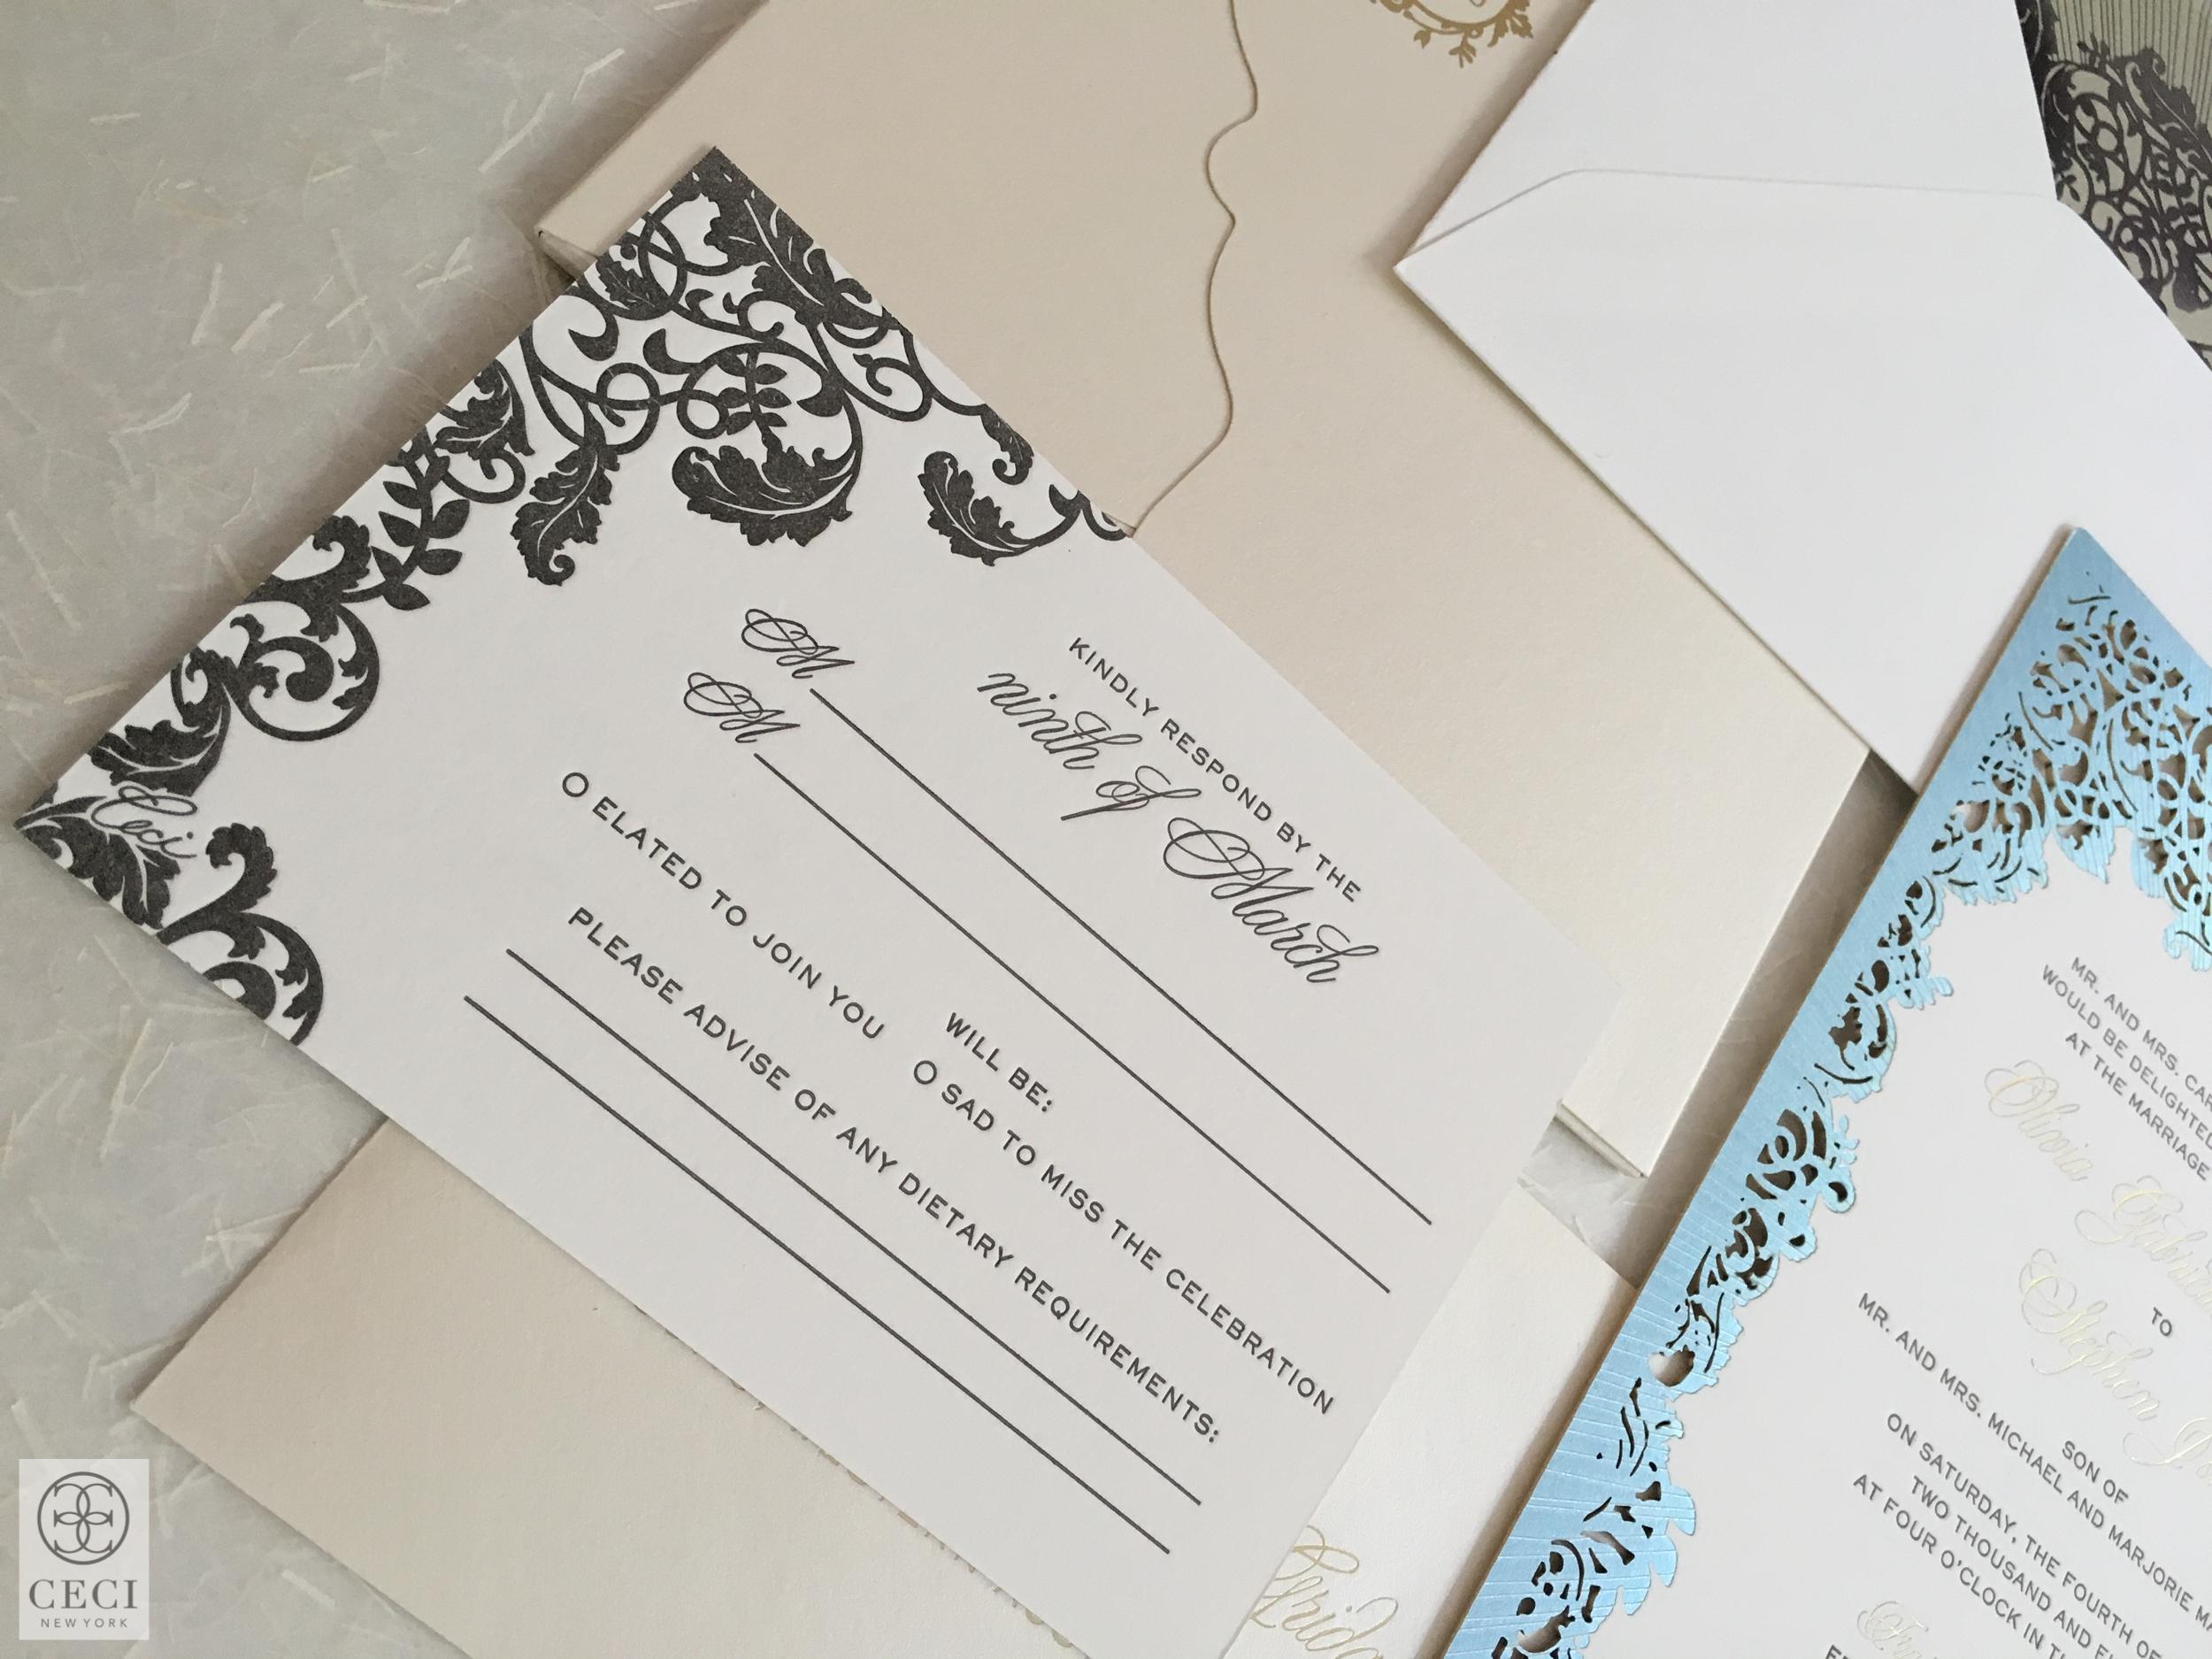 v2Ceci_New_York_Custom_Luxury_Wedding_BeautyShot_LaserCut_Stationery_Personalized_Couture_Foil_Stamping_Perth_Destination_Australia_Chic_-8.jpg